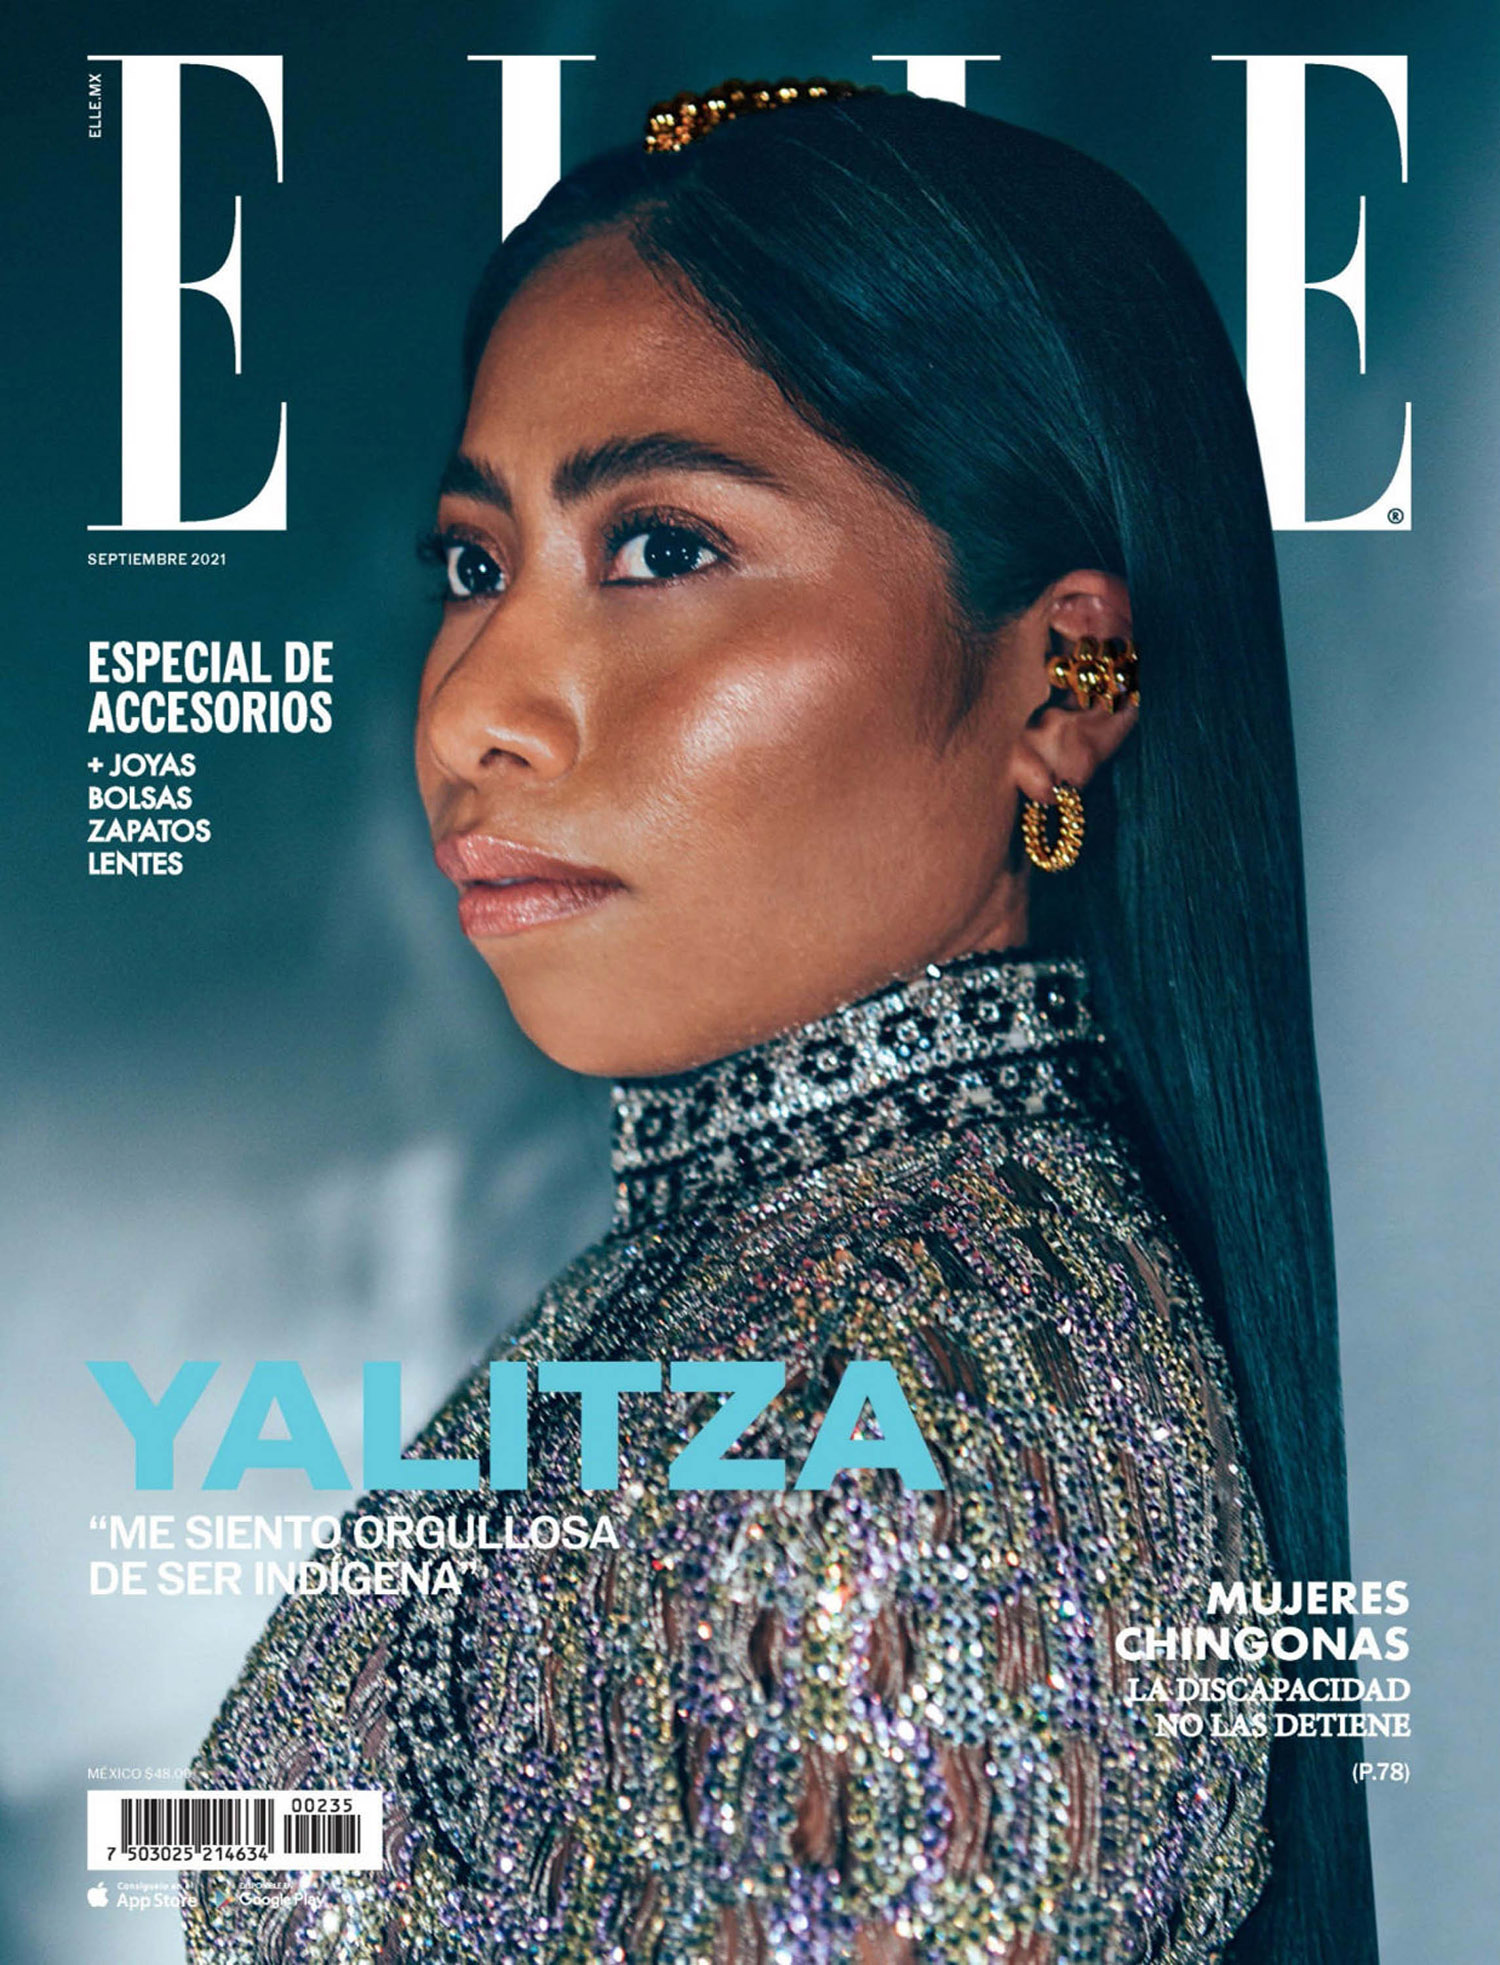 Yalitza Aparicio covers Elle Mexico September 2021 by Ximena Morfín